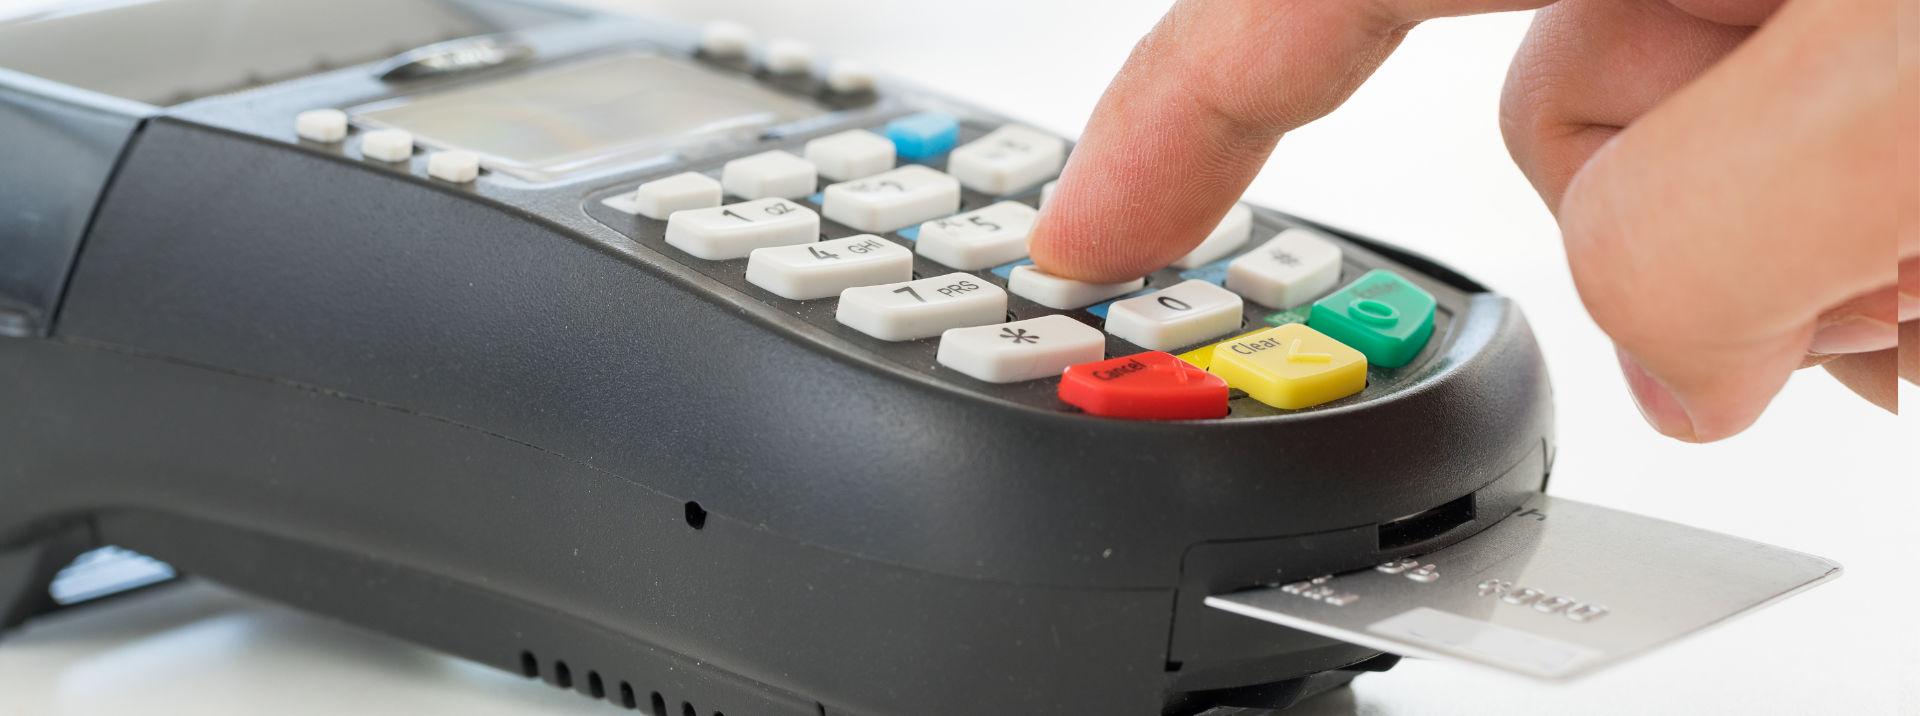 Ozark bank visa business debit card visa business debit card colourmoves Choice Image